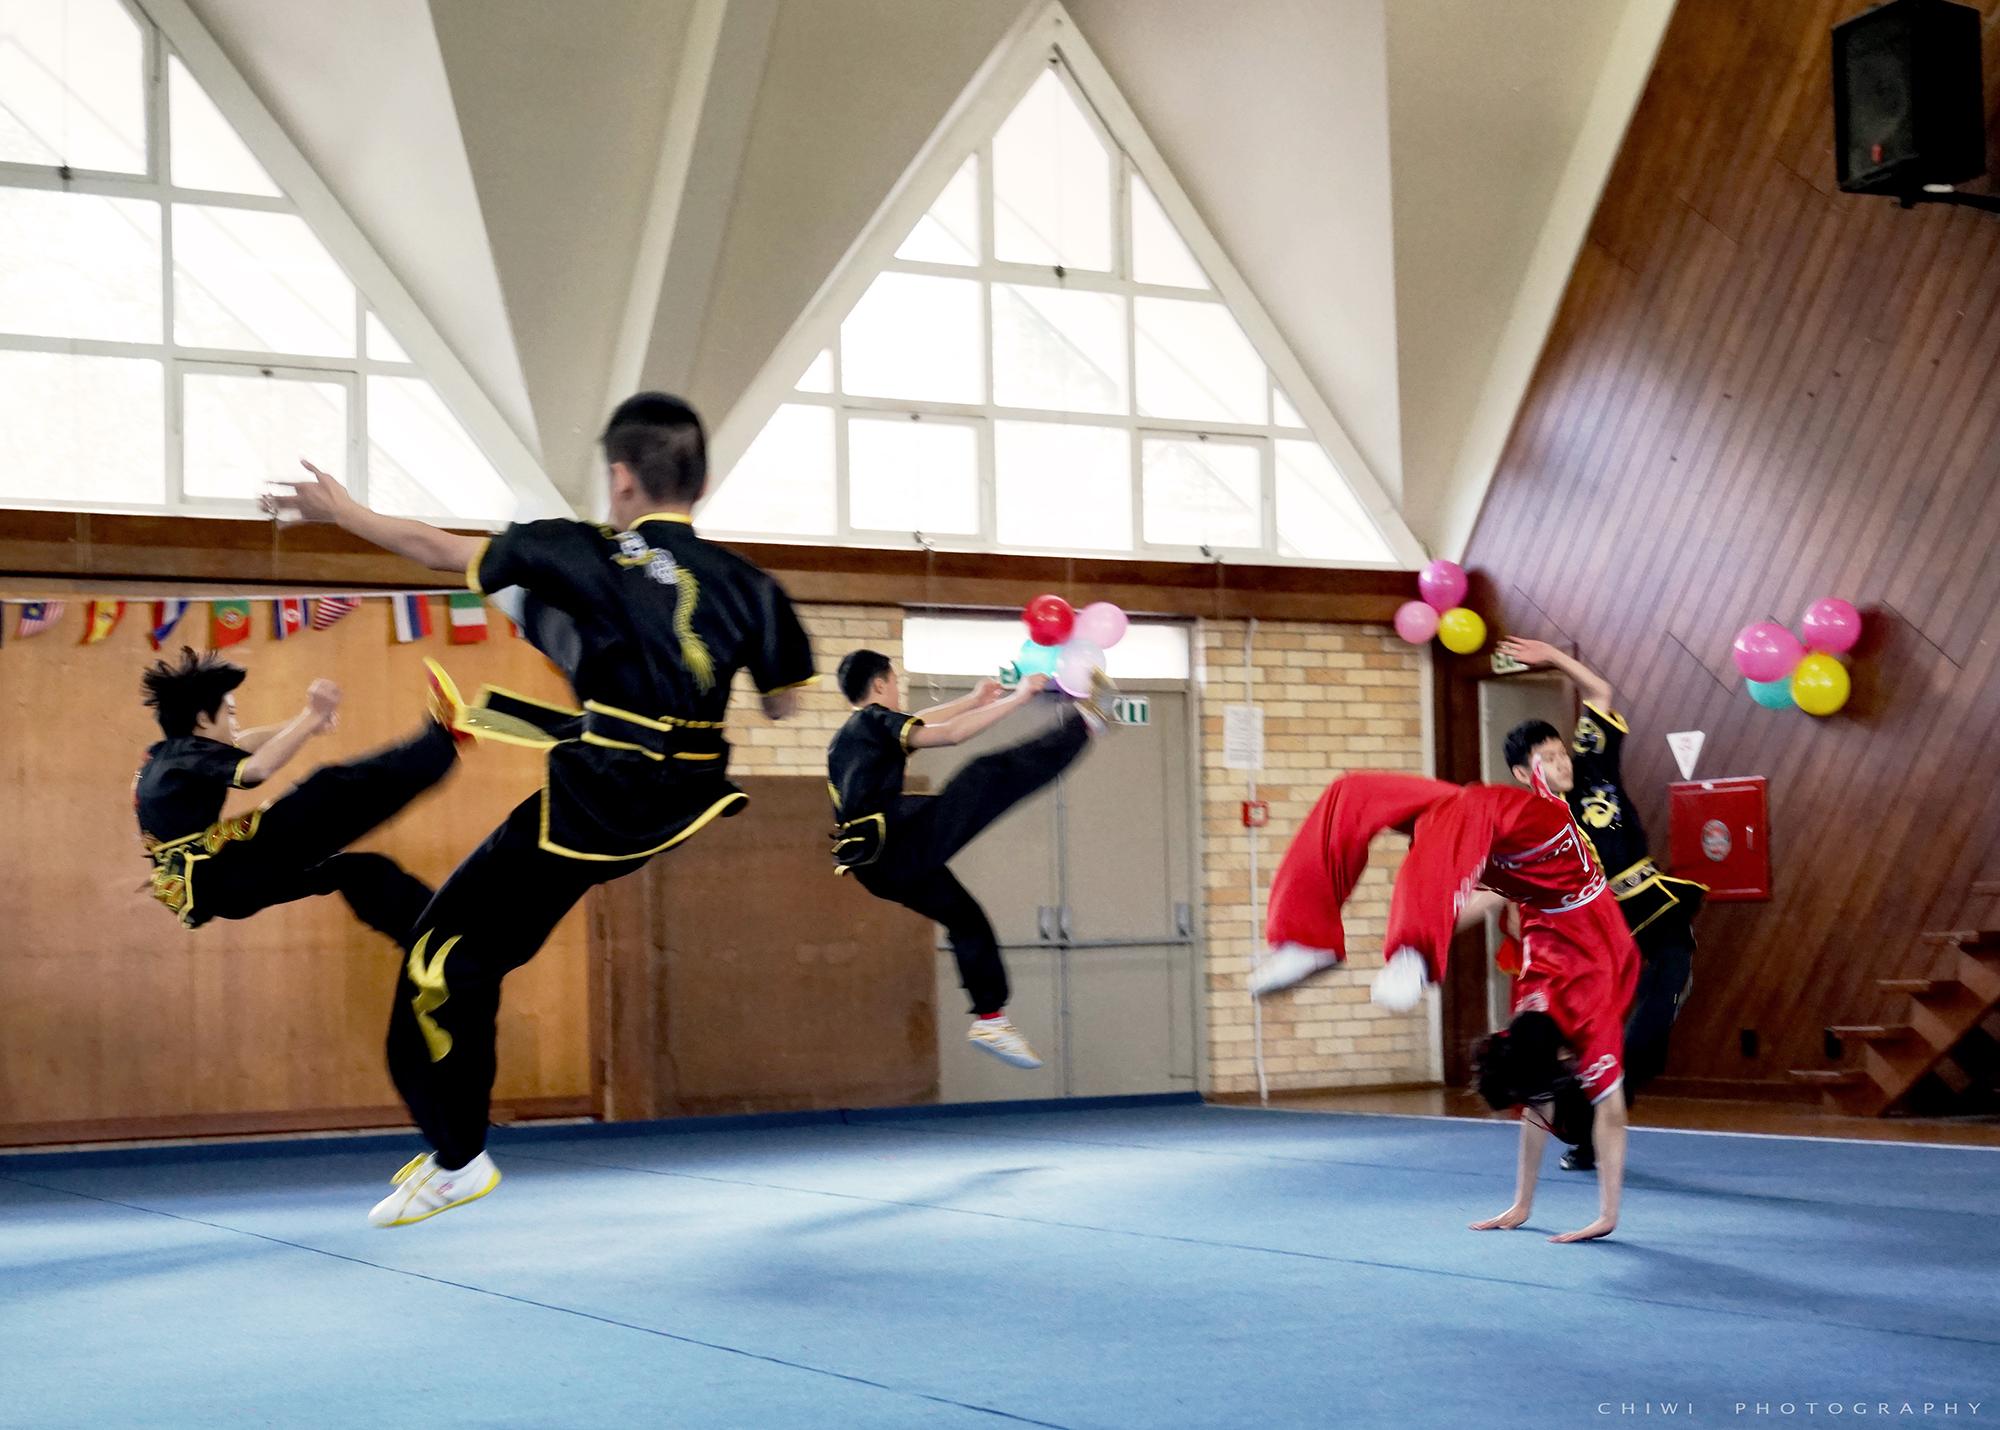 NZ Wushu performance jump back handspring